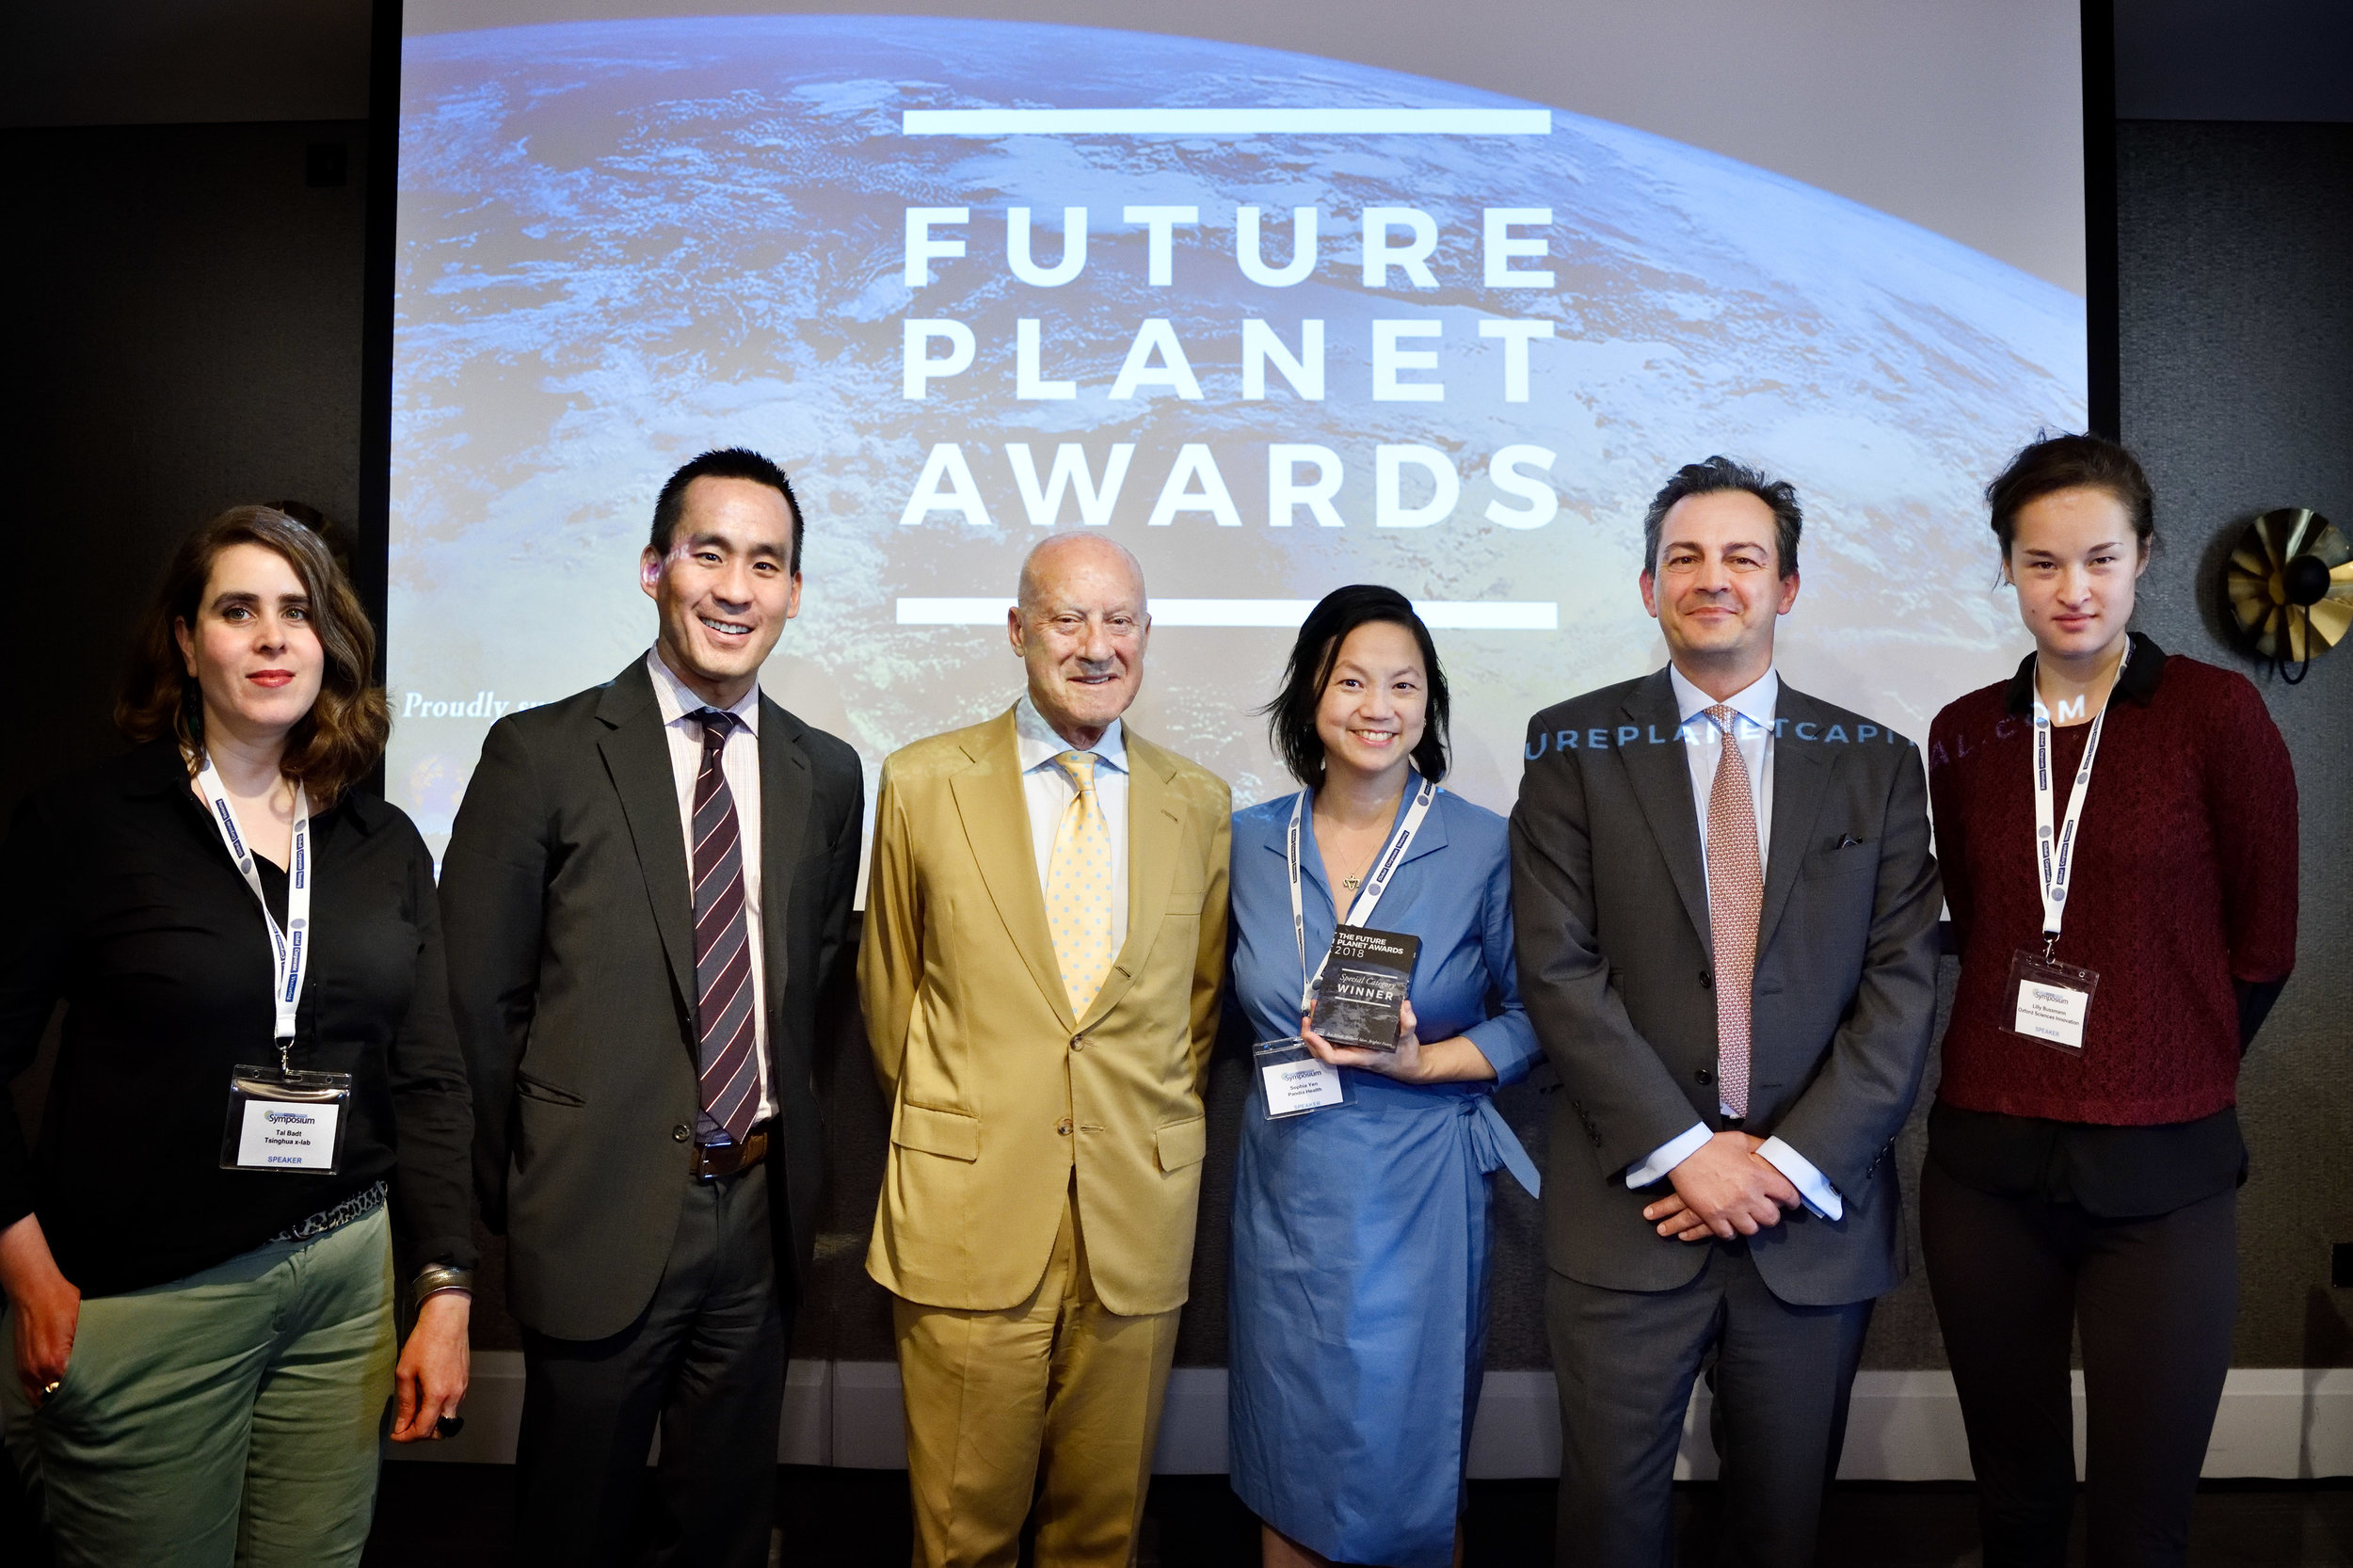 BvOF 2018_0522_BOO - Global Corporate Venturing Symposium - Future Planet Awards.jpg